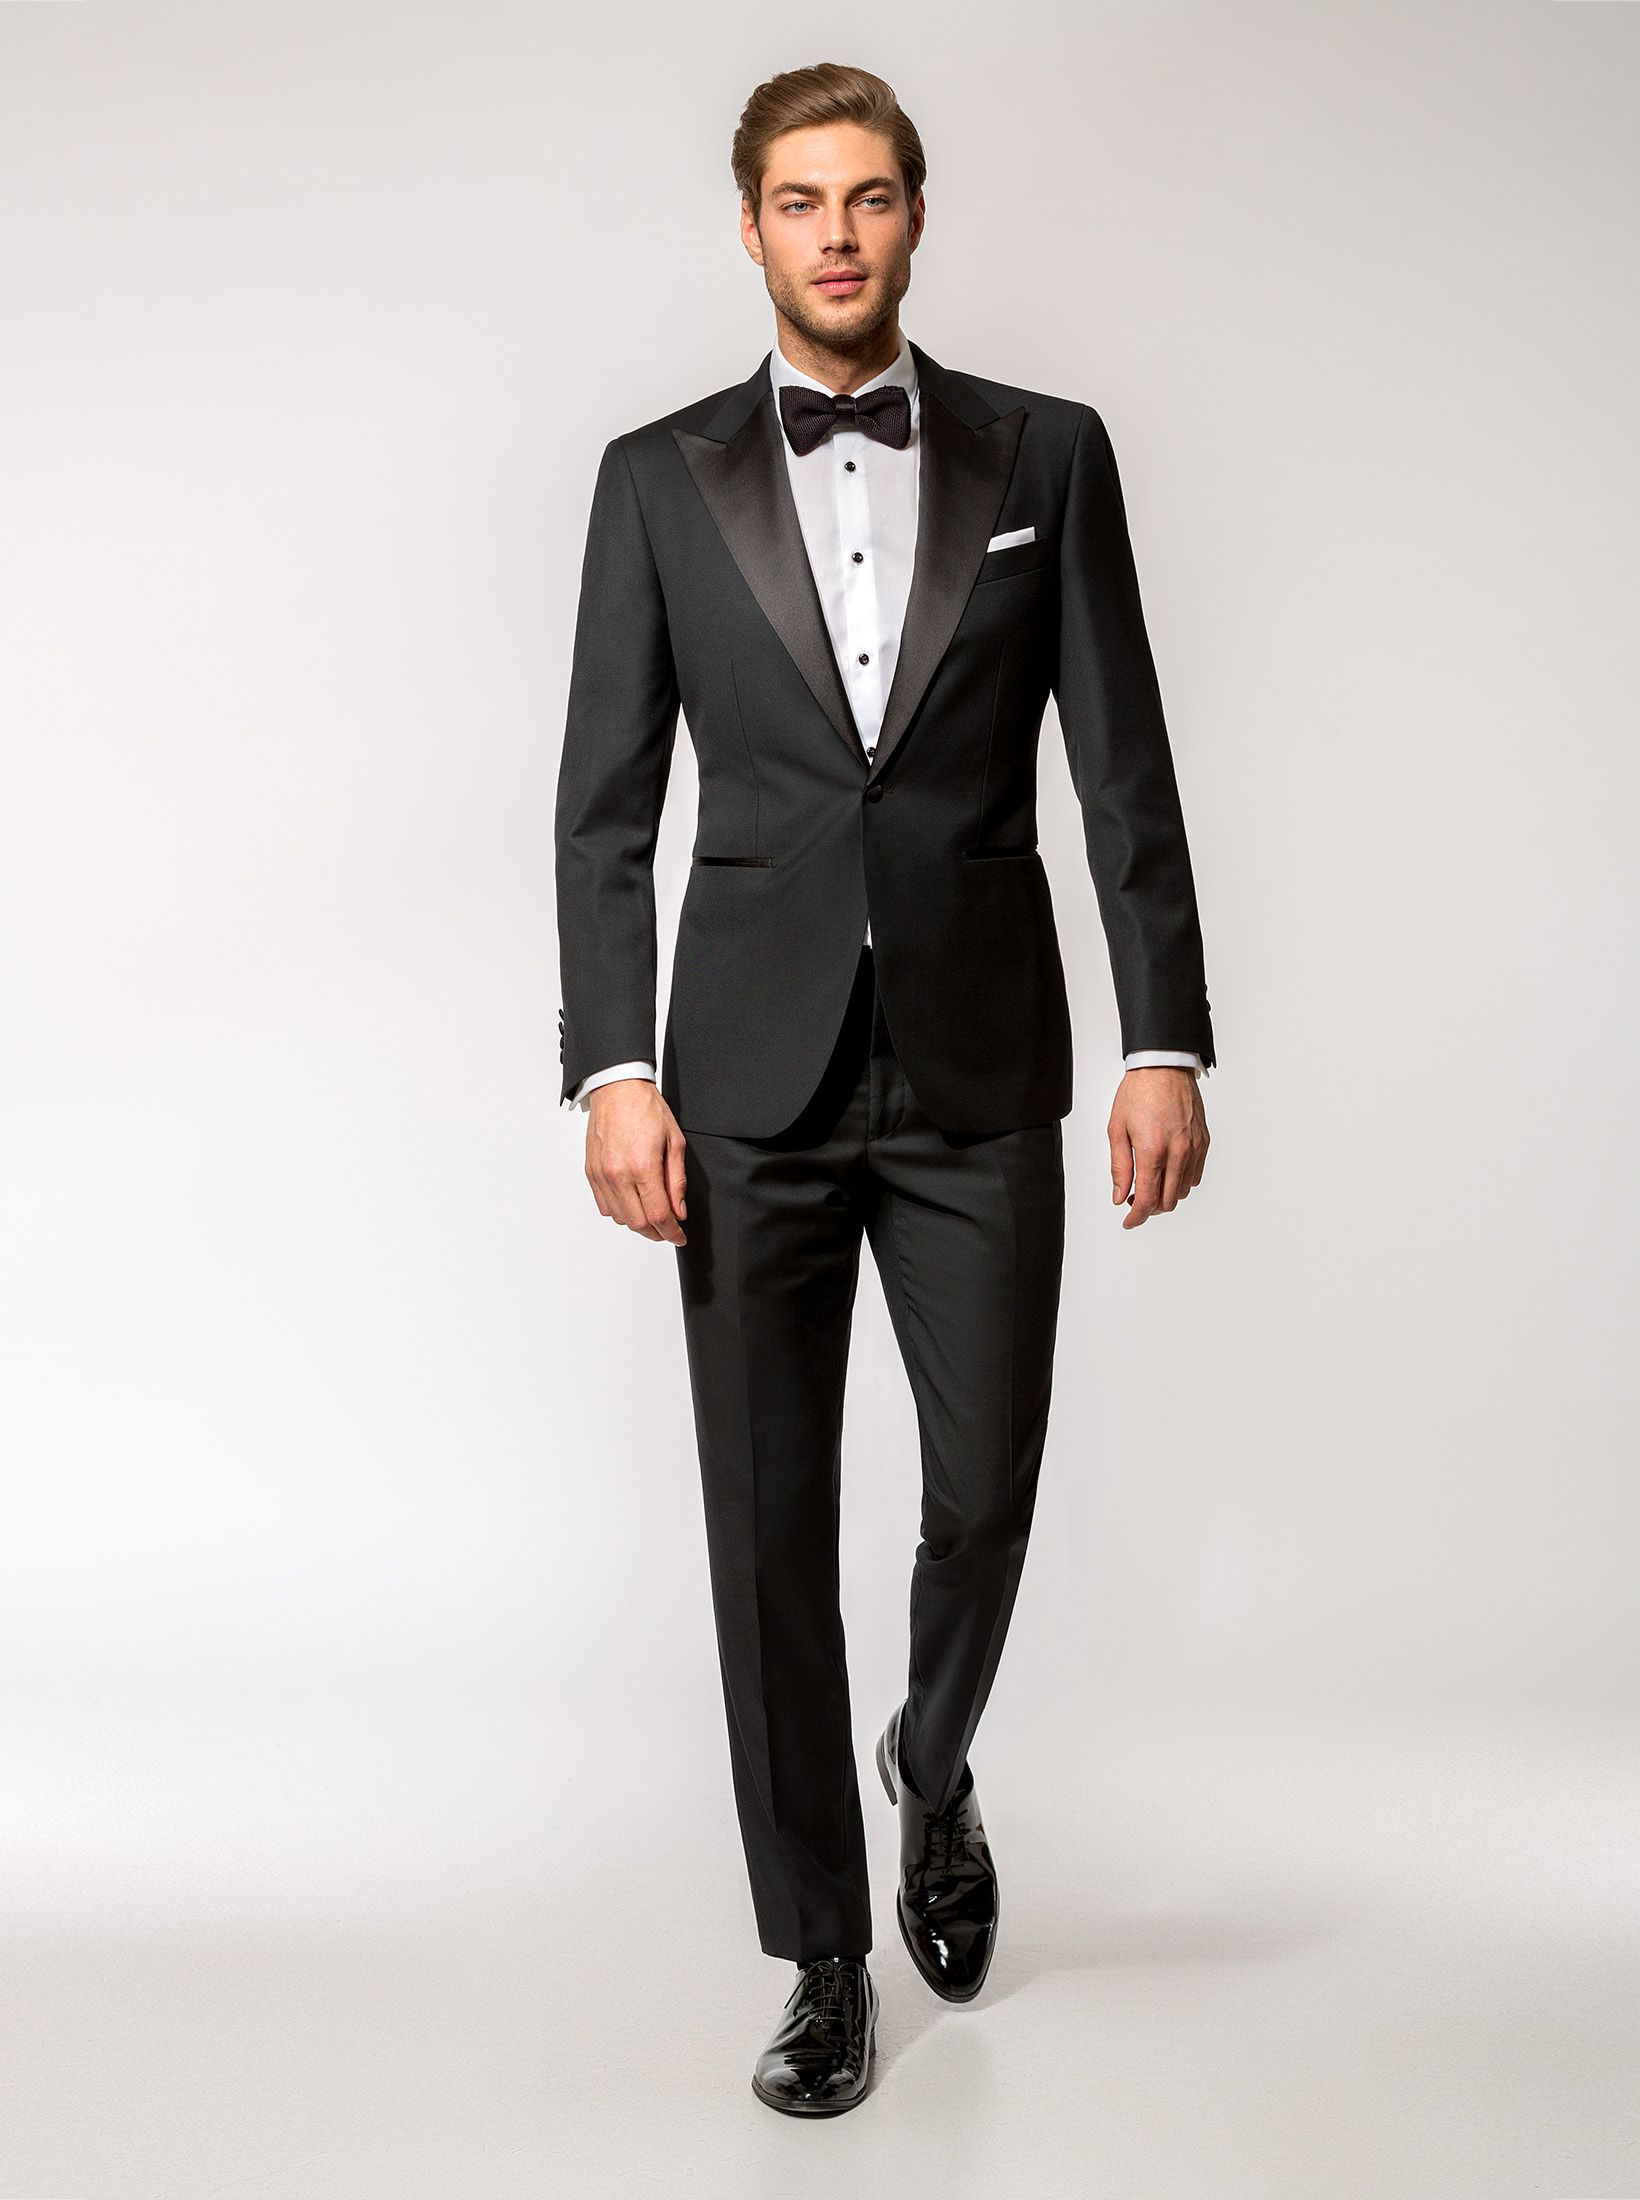 Smoking black tie Bing Crosby - CONSIGLIERI | Costume la comanda | Made-to-